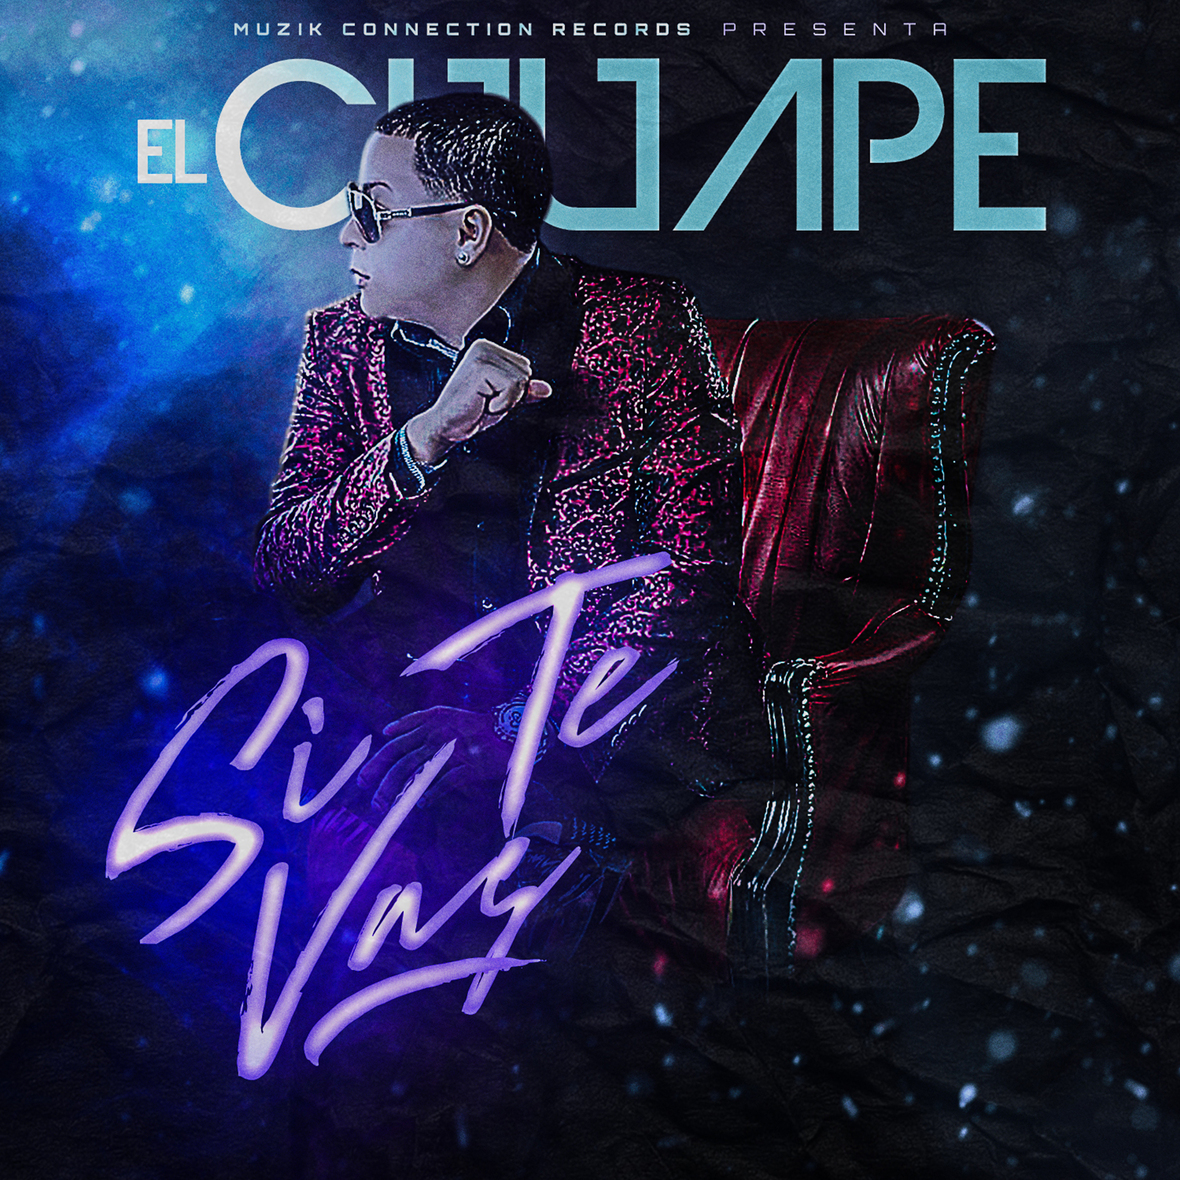 El Chuape - Si Te Vas Cover sencillo